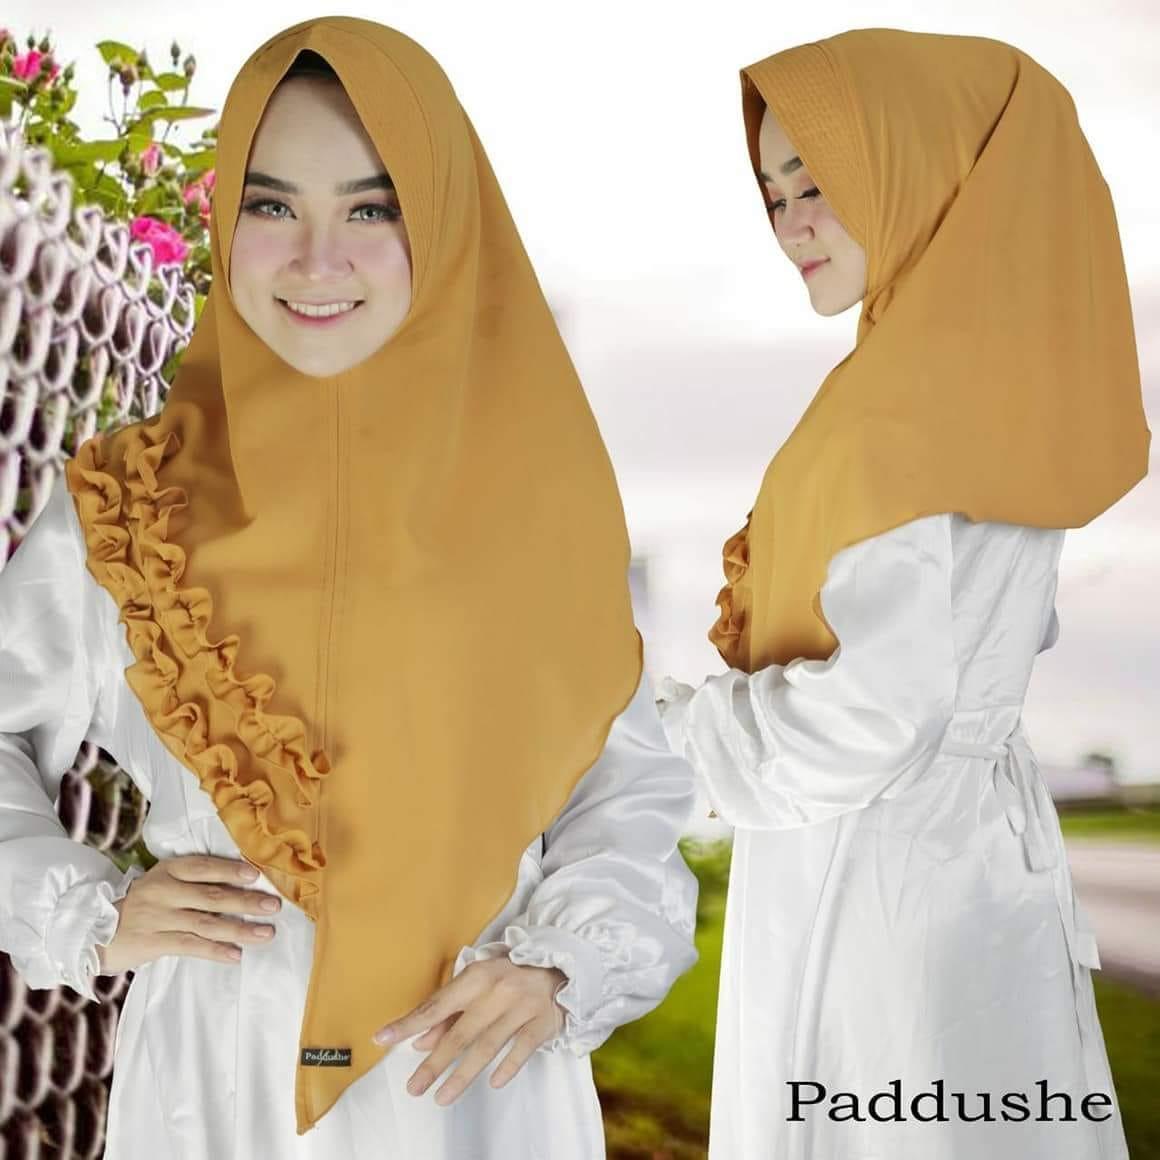 Fashion Hijab Instan Daftar Harga Desember 2018 Dksh New Arrival Sendal Tali Trendy Wanita Dknz 378 Jilbab Model Bergo Terbaru Termurah Dan Terlaris Kerudung Paddushe Rempel Samping